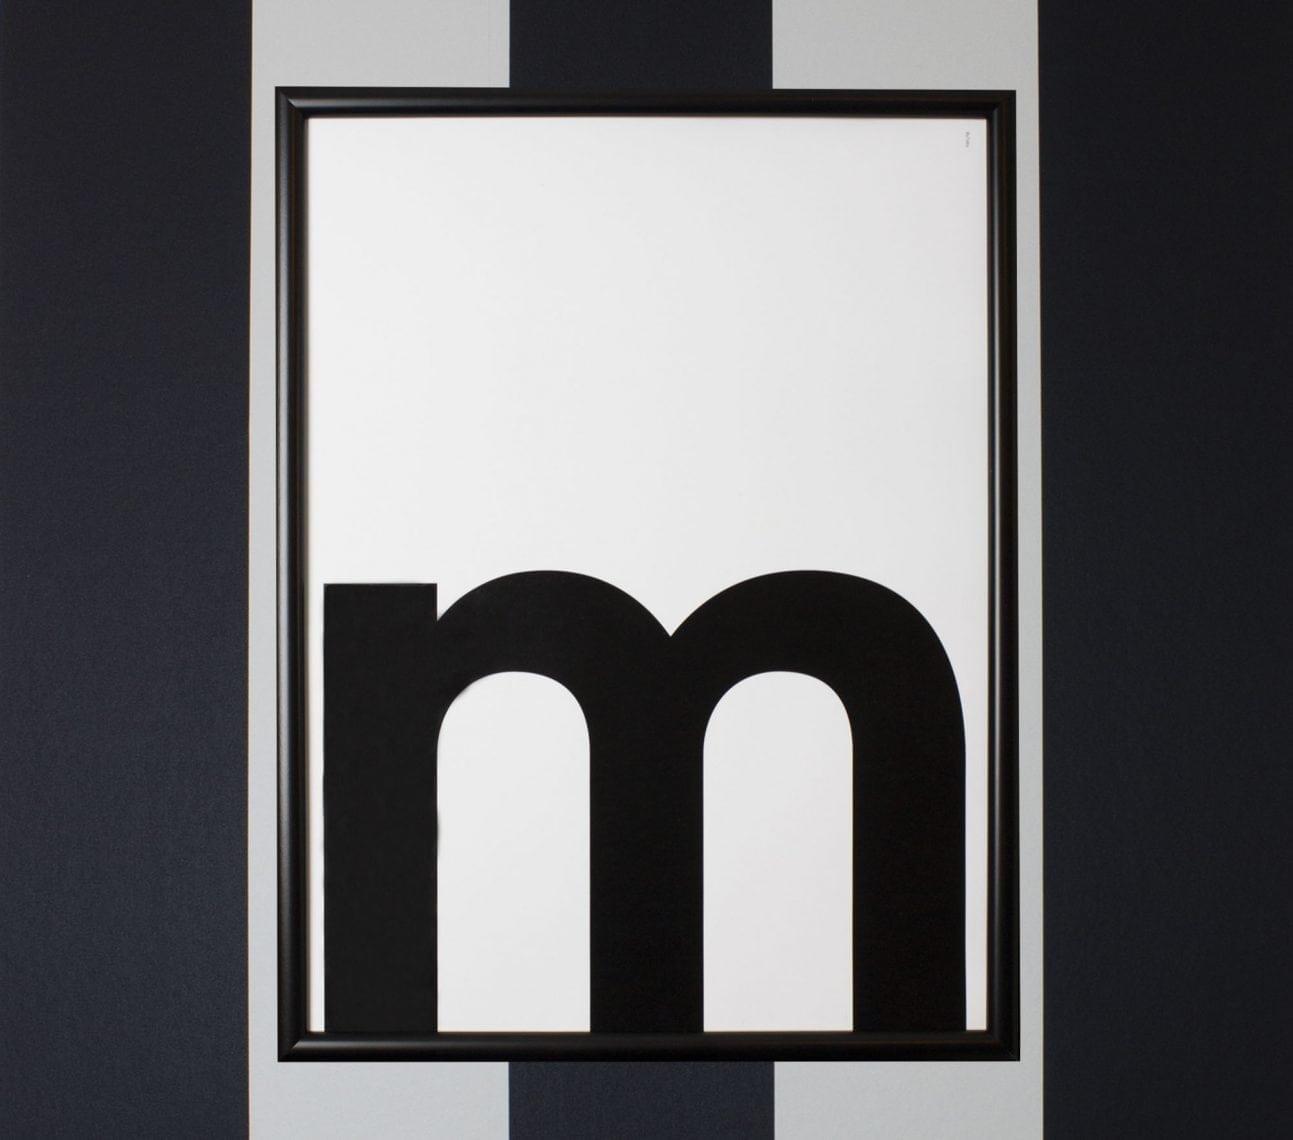 Poster m – affisch barnrum